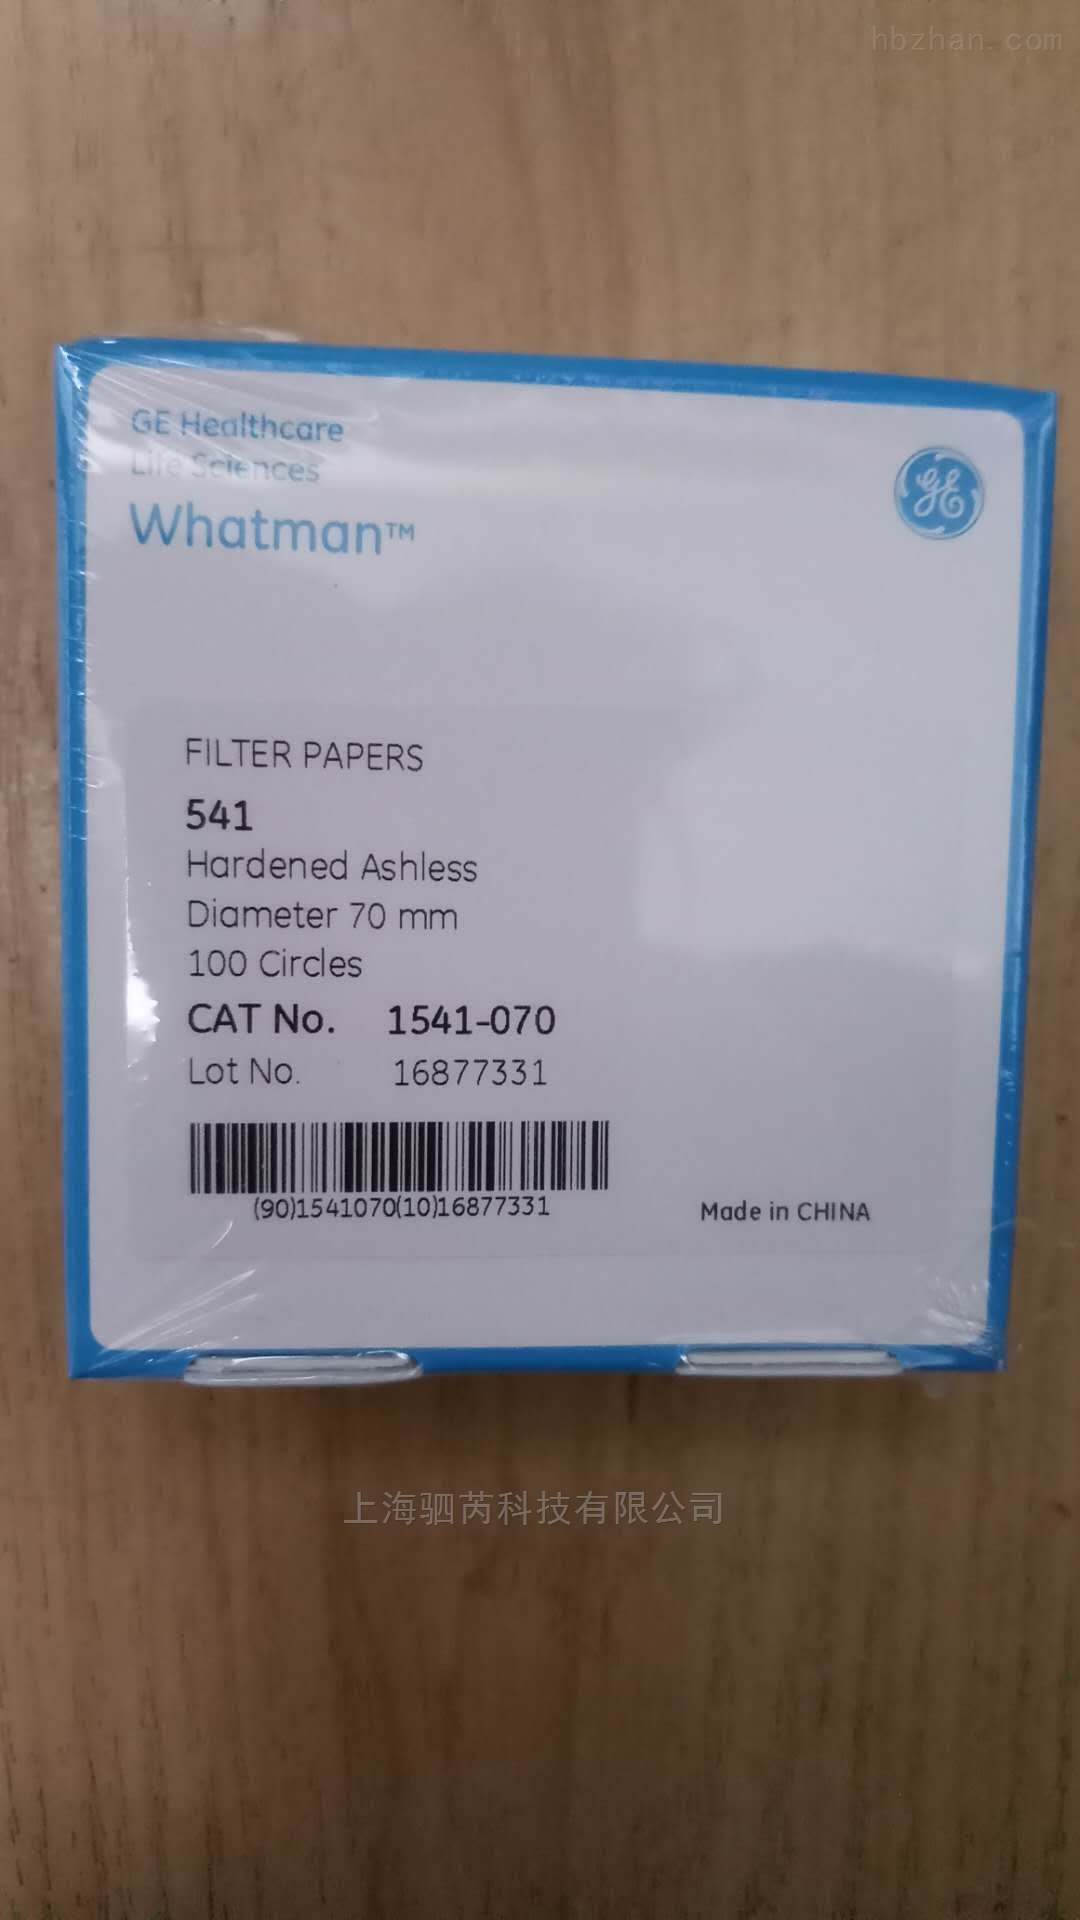 whatman541号滤纸1541-070